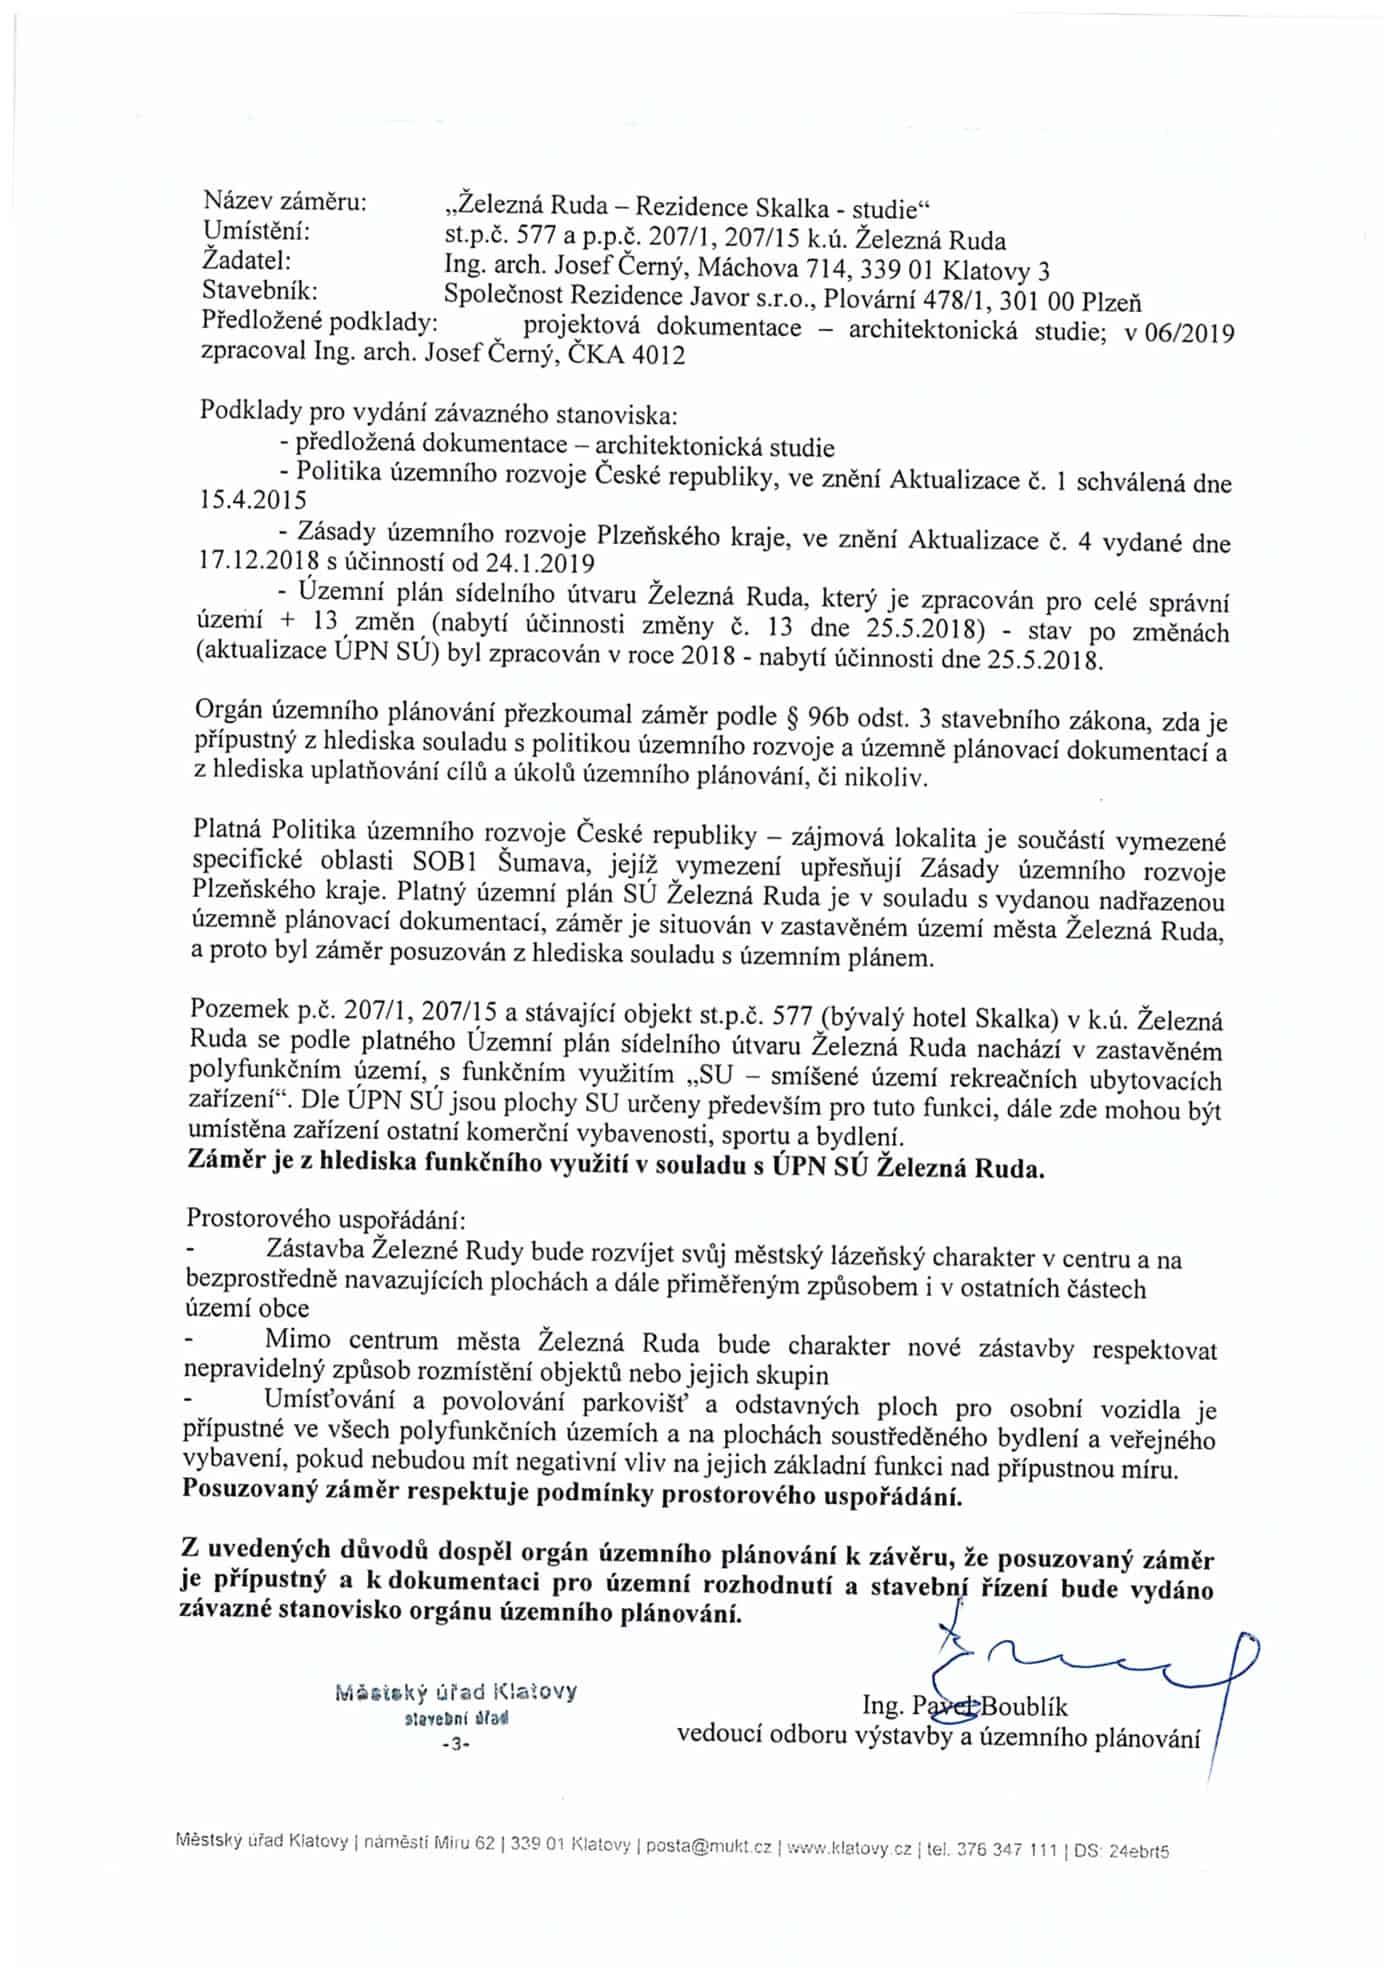 Odbor-vystavby-MU-Klatovy-vyjadreni-Rezidence-Skalka